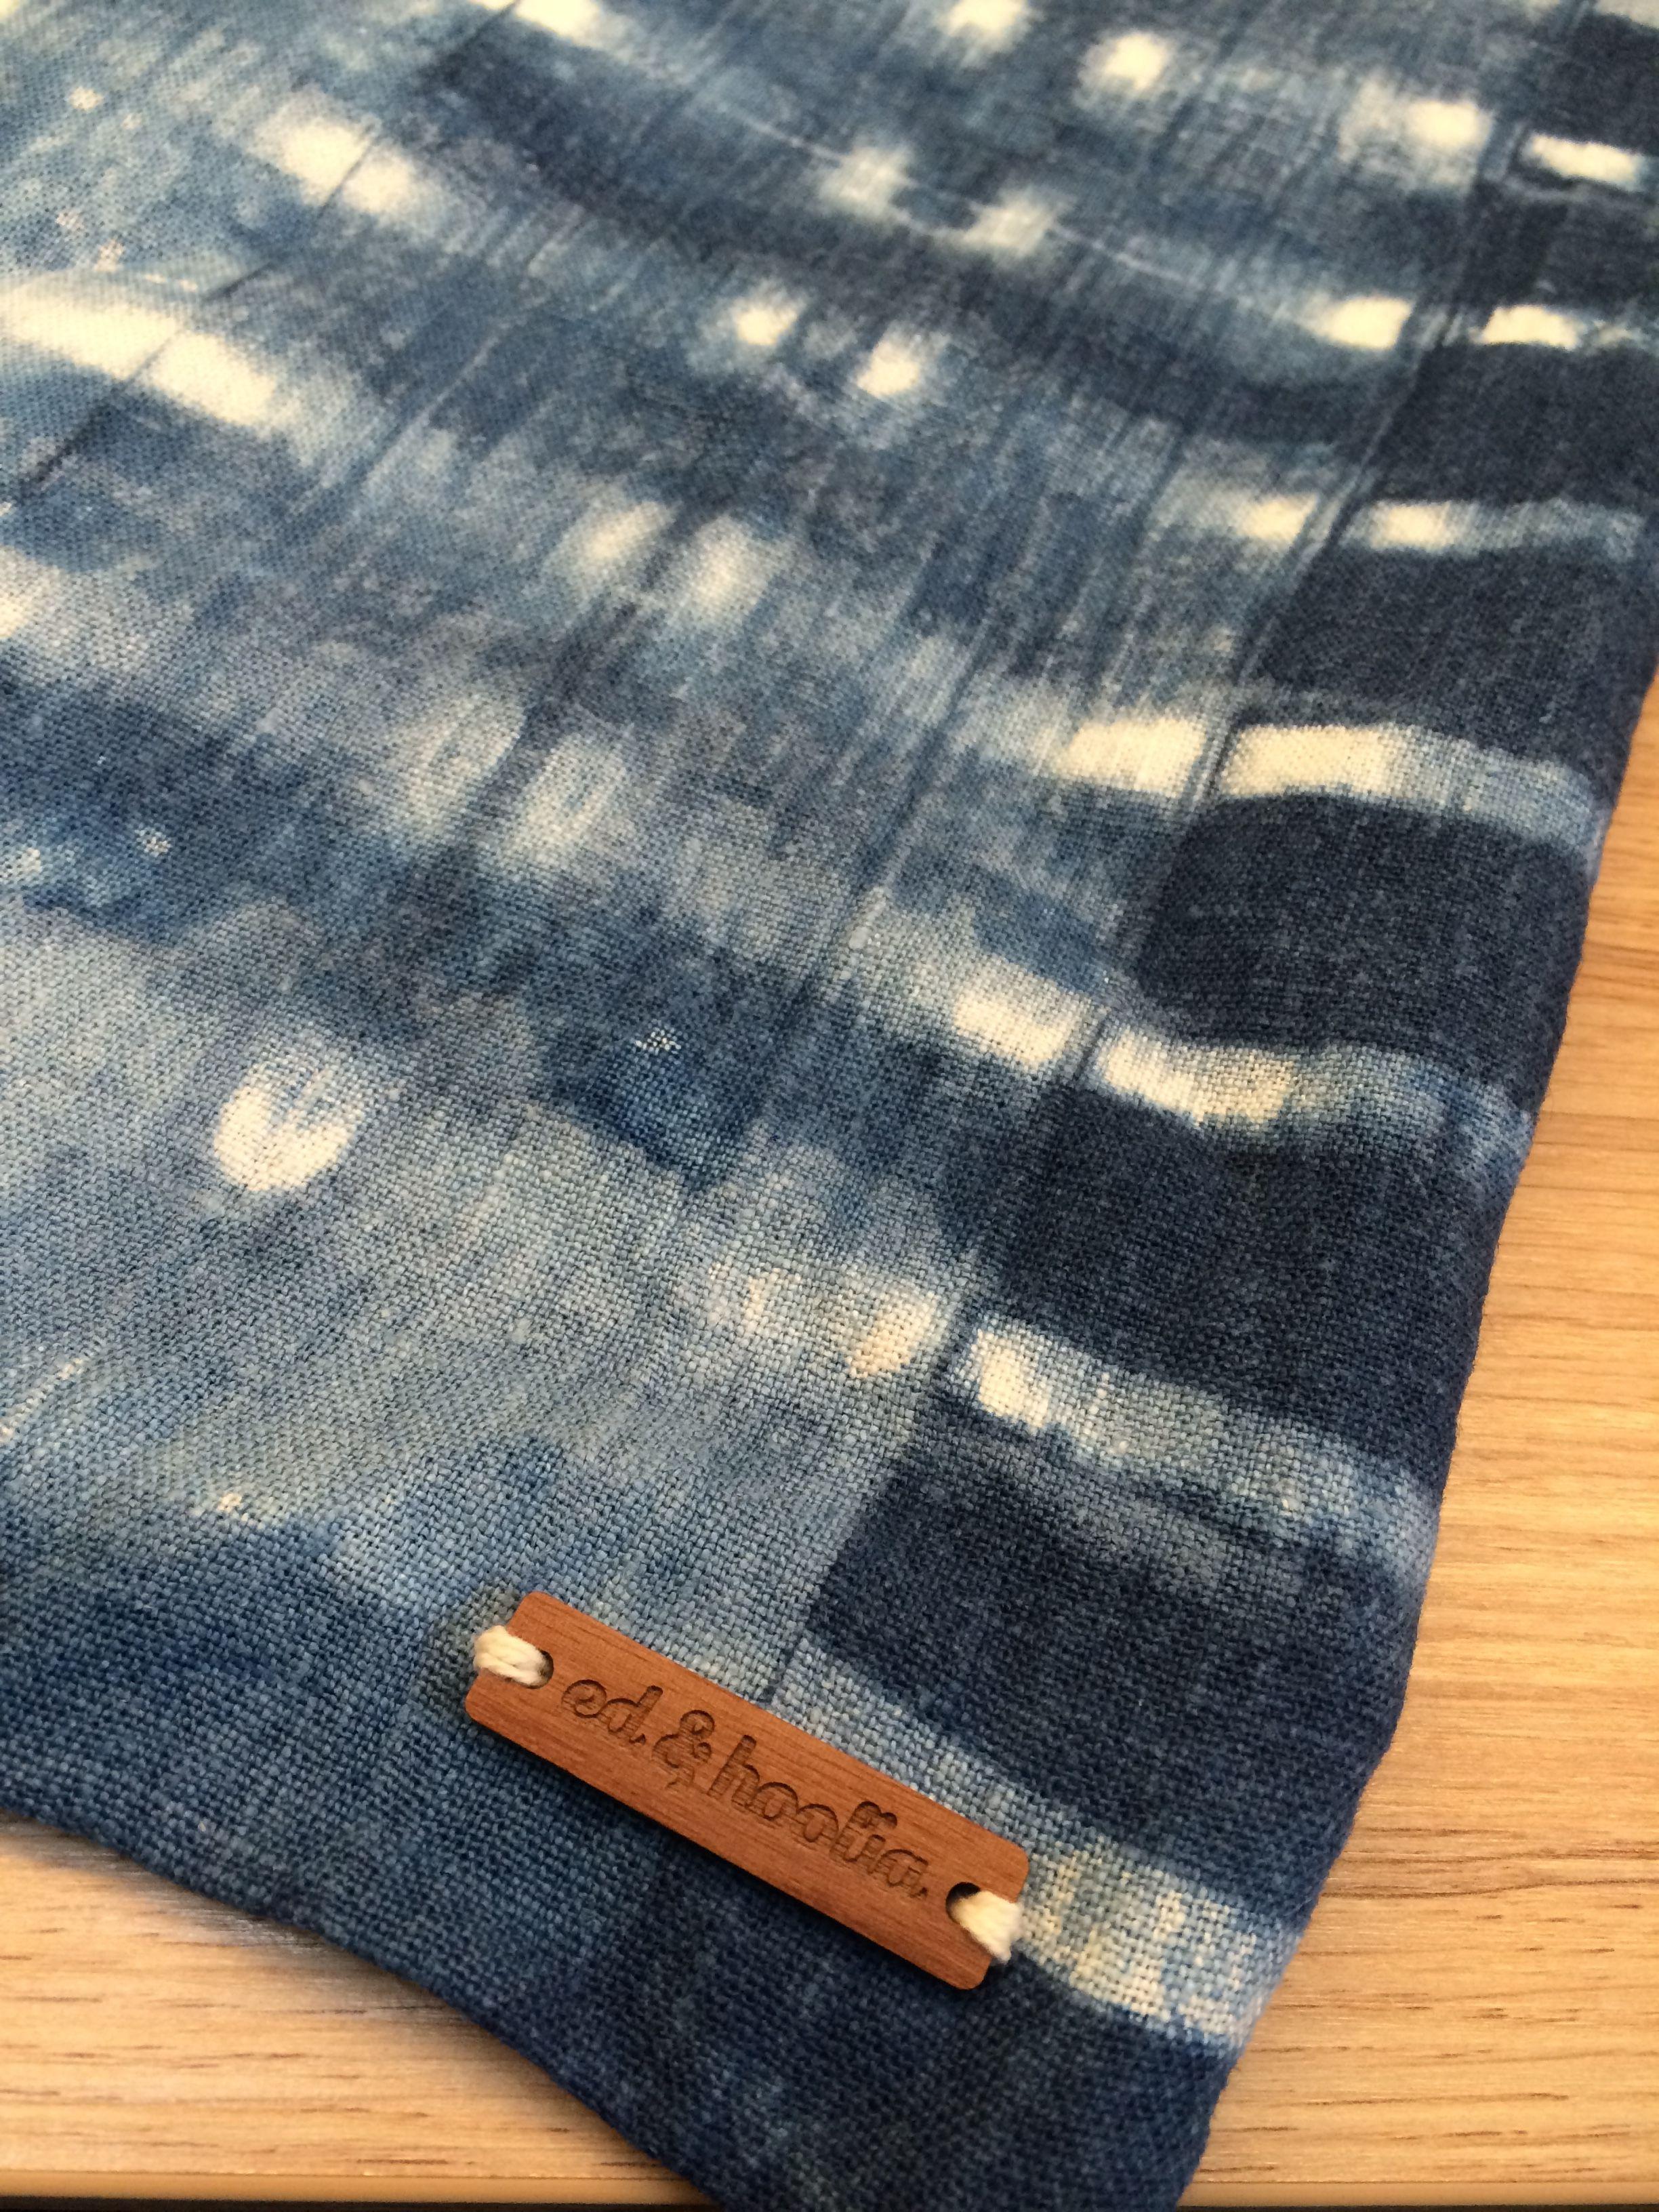 Thoroughly enjoyed hand stitching our new wooden tag to this gorgeous made-to-order indigo shibori cushion cover. #shibori #indigo #wood #branding #cushions #handmade #madetoorder